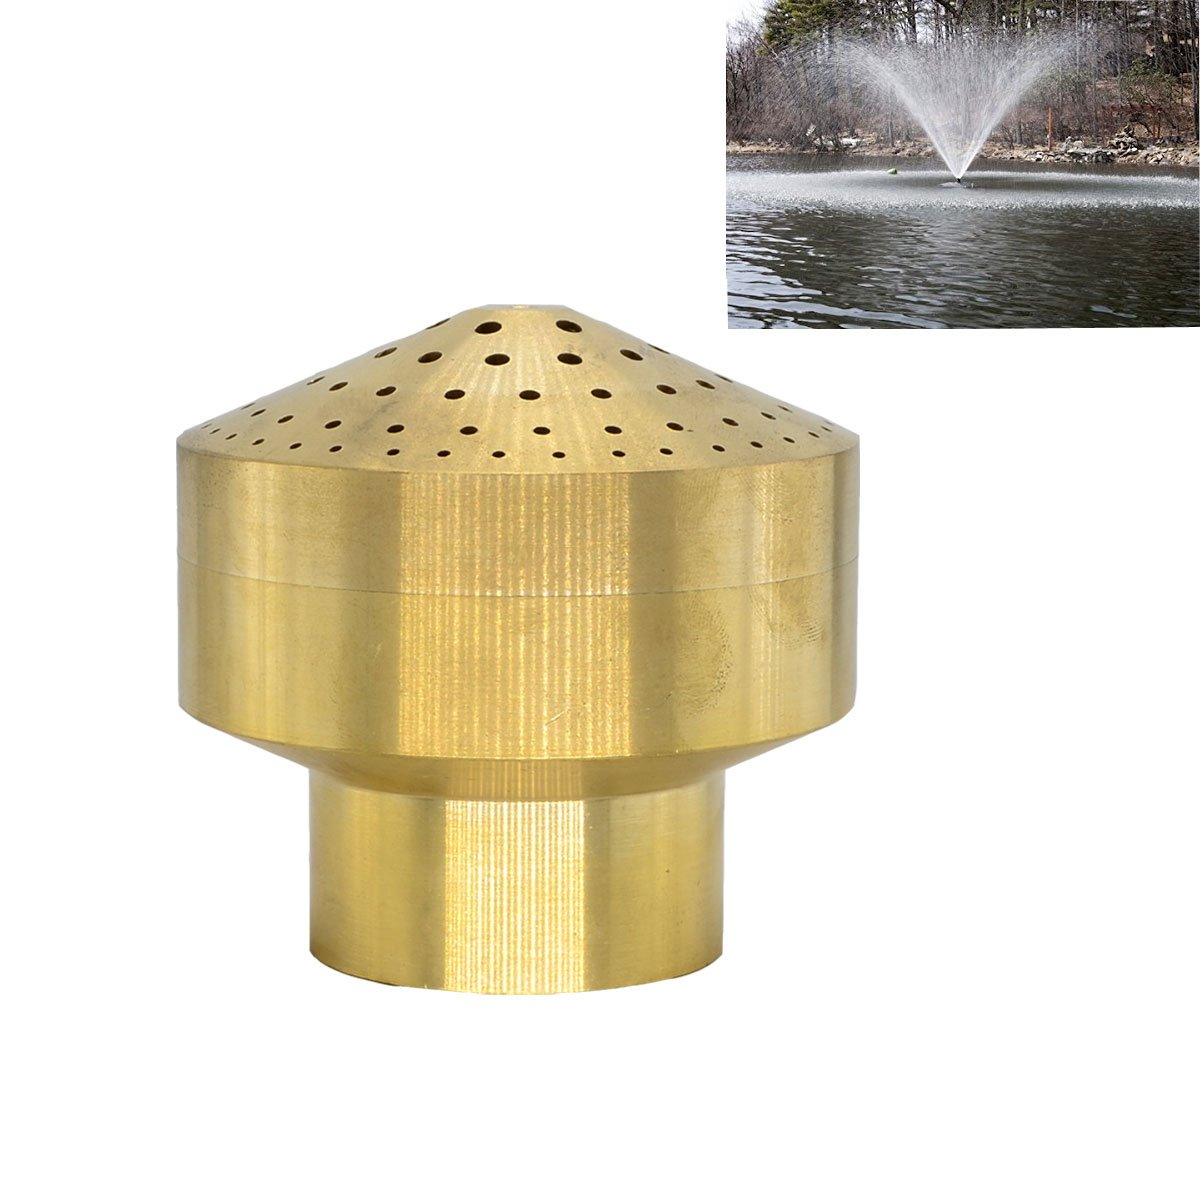 Brass Column Garden Square Fireworks Pool Pond Fountain Nozzle Sprinkler Spray Head SSH328 (1.5'')